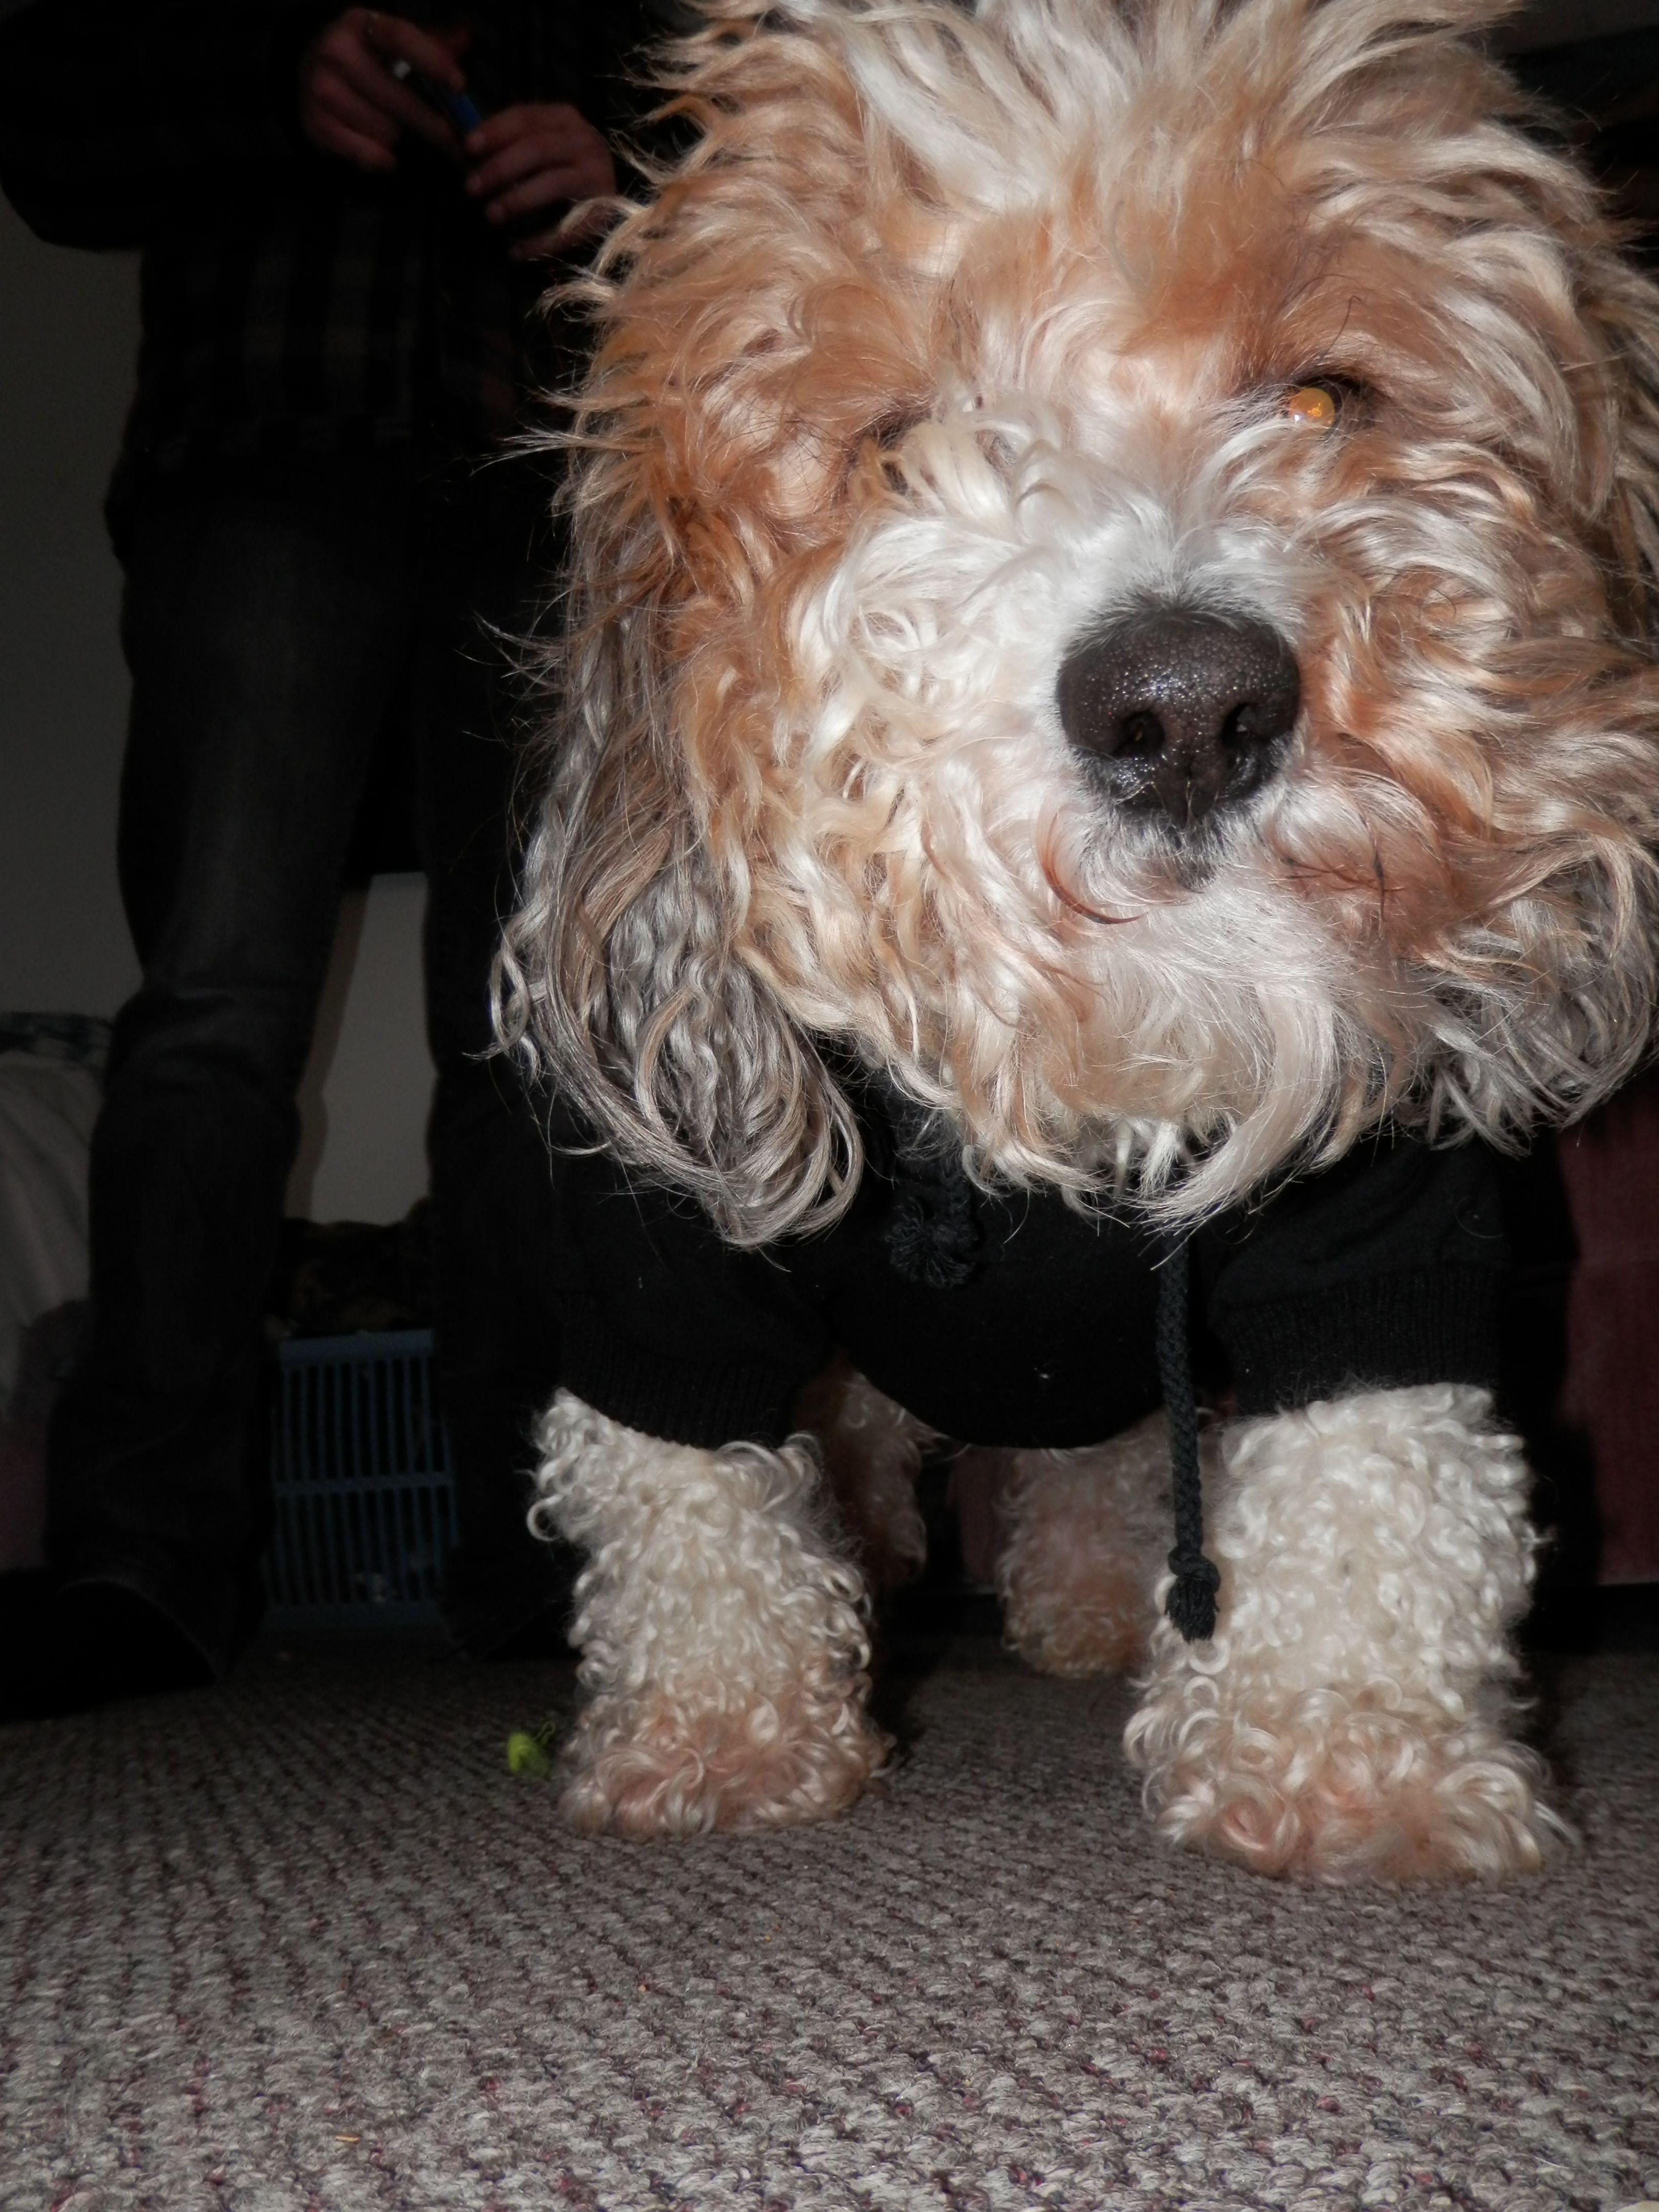 Bichon Frise/Shih Tzu. Wearing a sweater = Adorable. Teddy Bear Dog